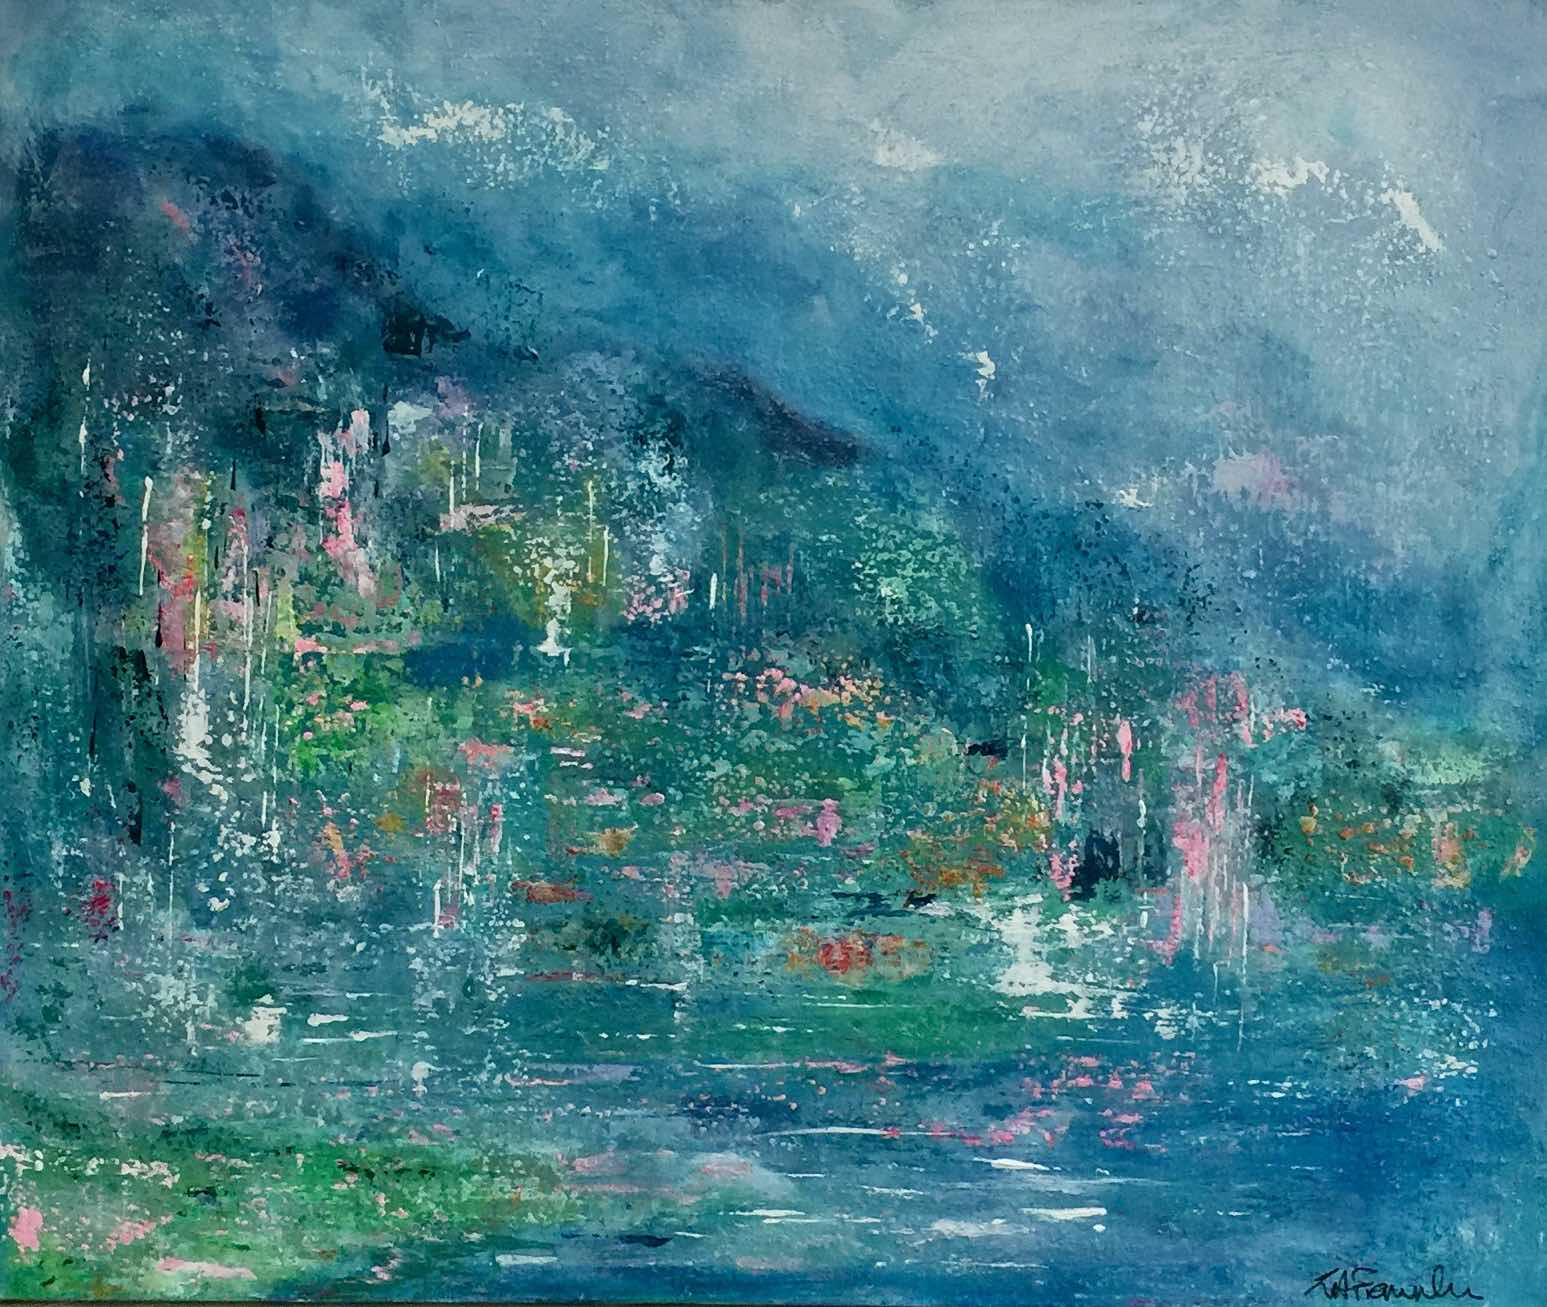 <span class=&#34;link fancybox-details-link&#34;><a href=&#34;/artists/38-linda-franklin/works/646-linda-franklin-lago/&#34;>View Detail Page</a></span><div class=&#34;artist&#34;><strong>Linda Franklin</strong></div> <div class=&#34;title&#34;><em>Lago</em></div> <div class=&#34;medium&#34;>Mixed Media on Canvas</div> <div class=&#34;dimensions&#34;>77 x 90 cm</div><div class=&#34;price&#34;>£1,800.00</div><div class=&#34;copyright_line&#34;>Copyright The Artist</div>